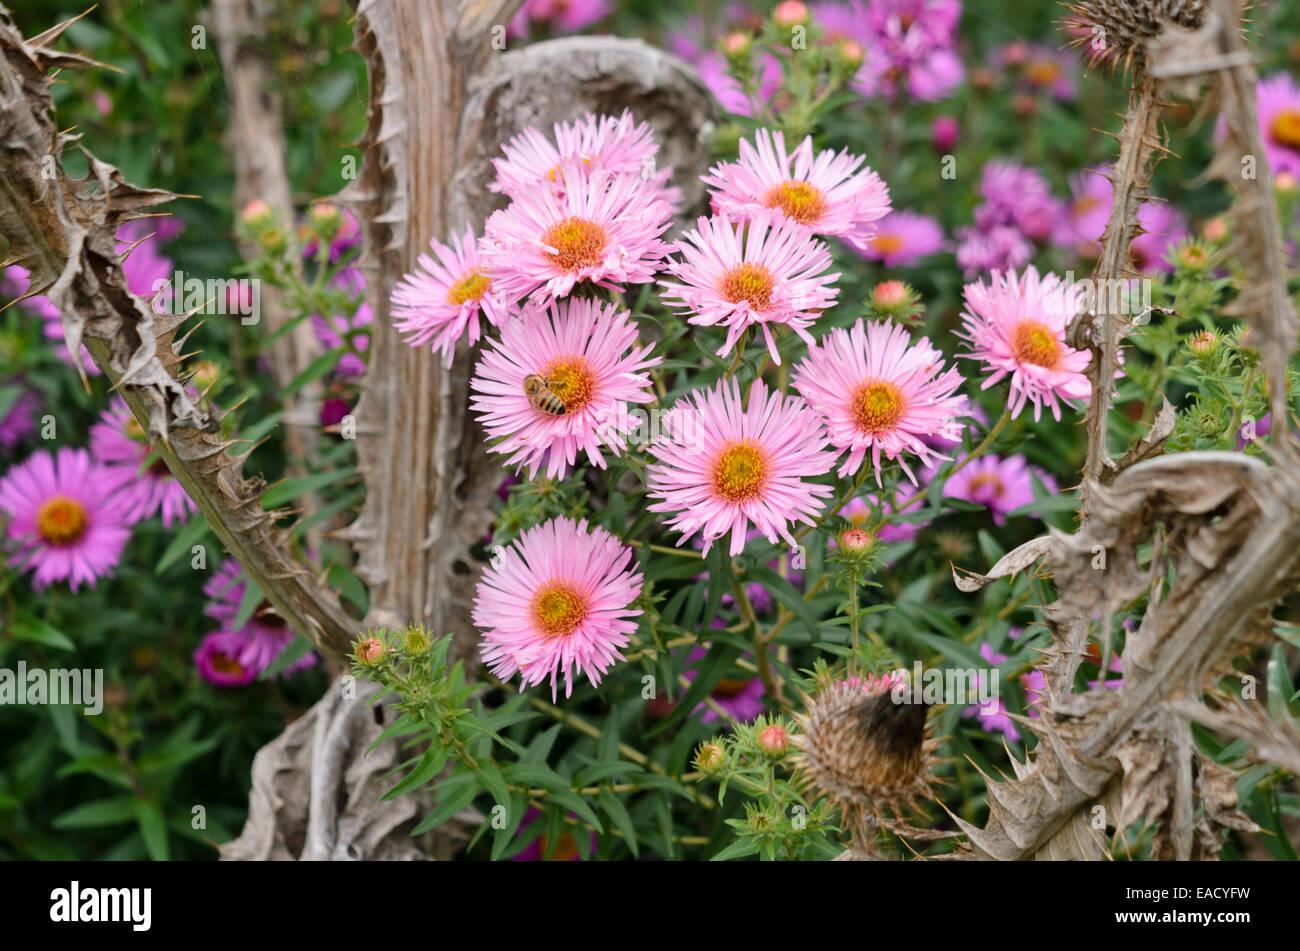 New England aster (Aster novae-angliae 'Rosa Sieger') - Stock Image